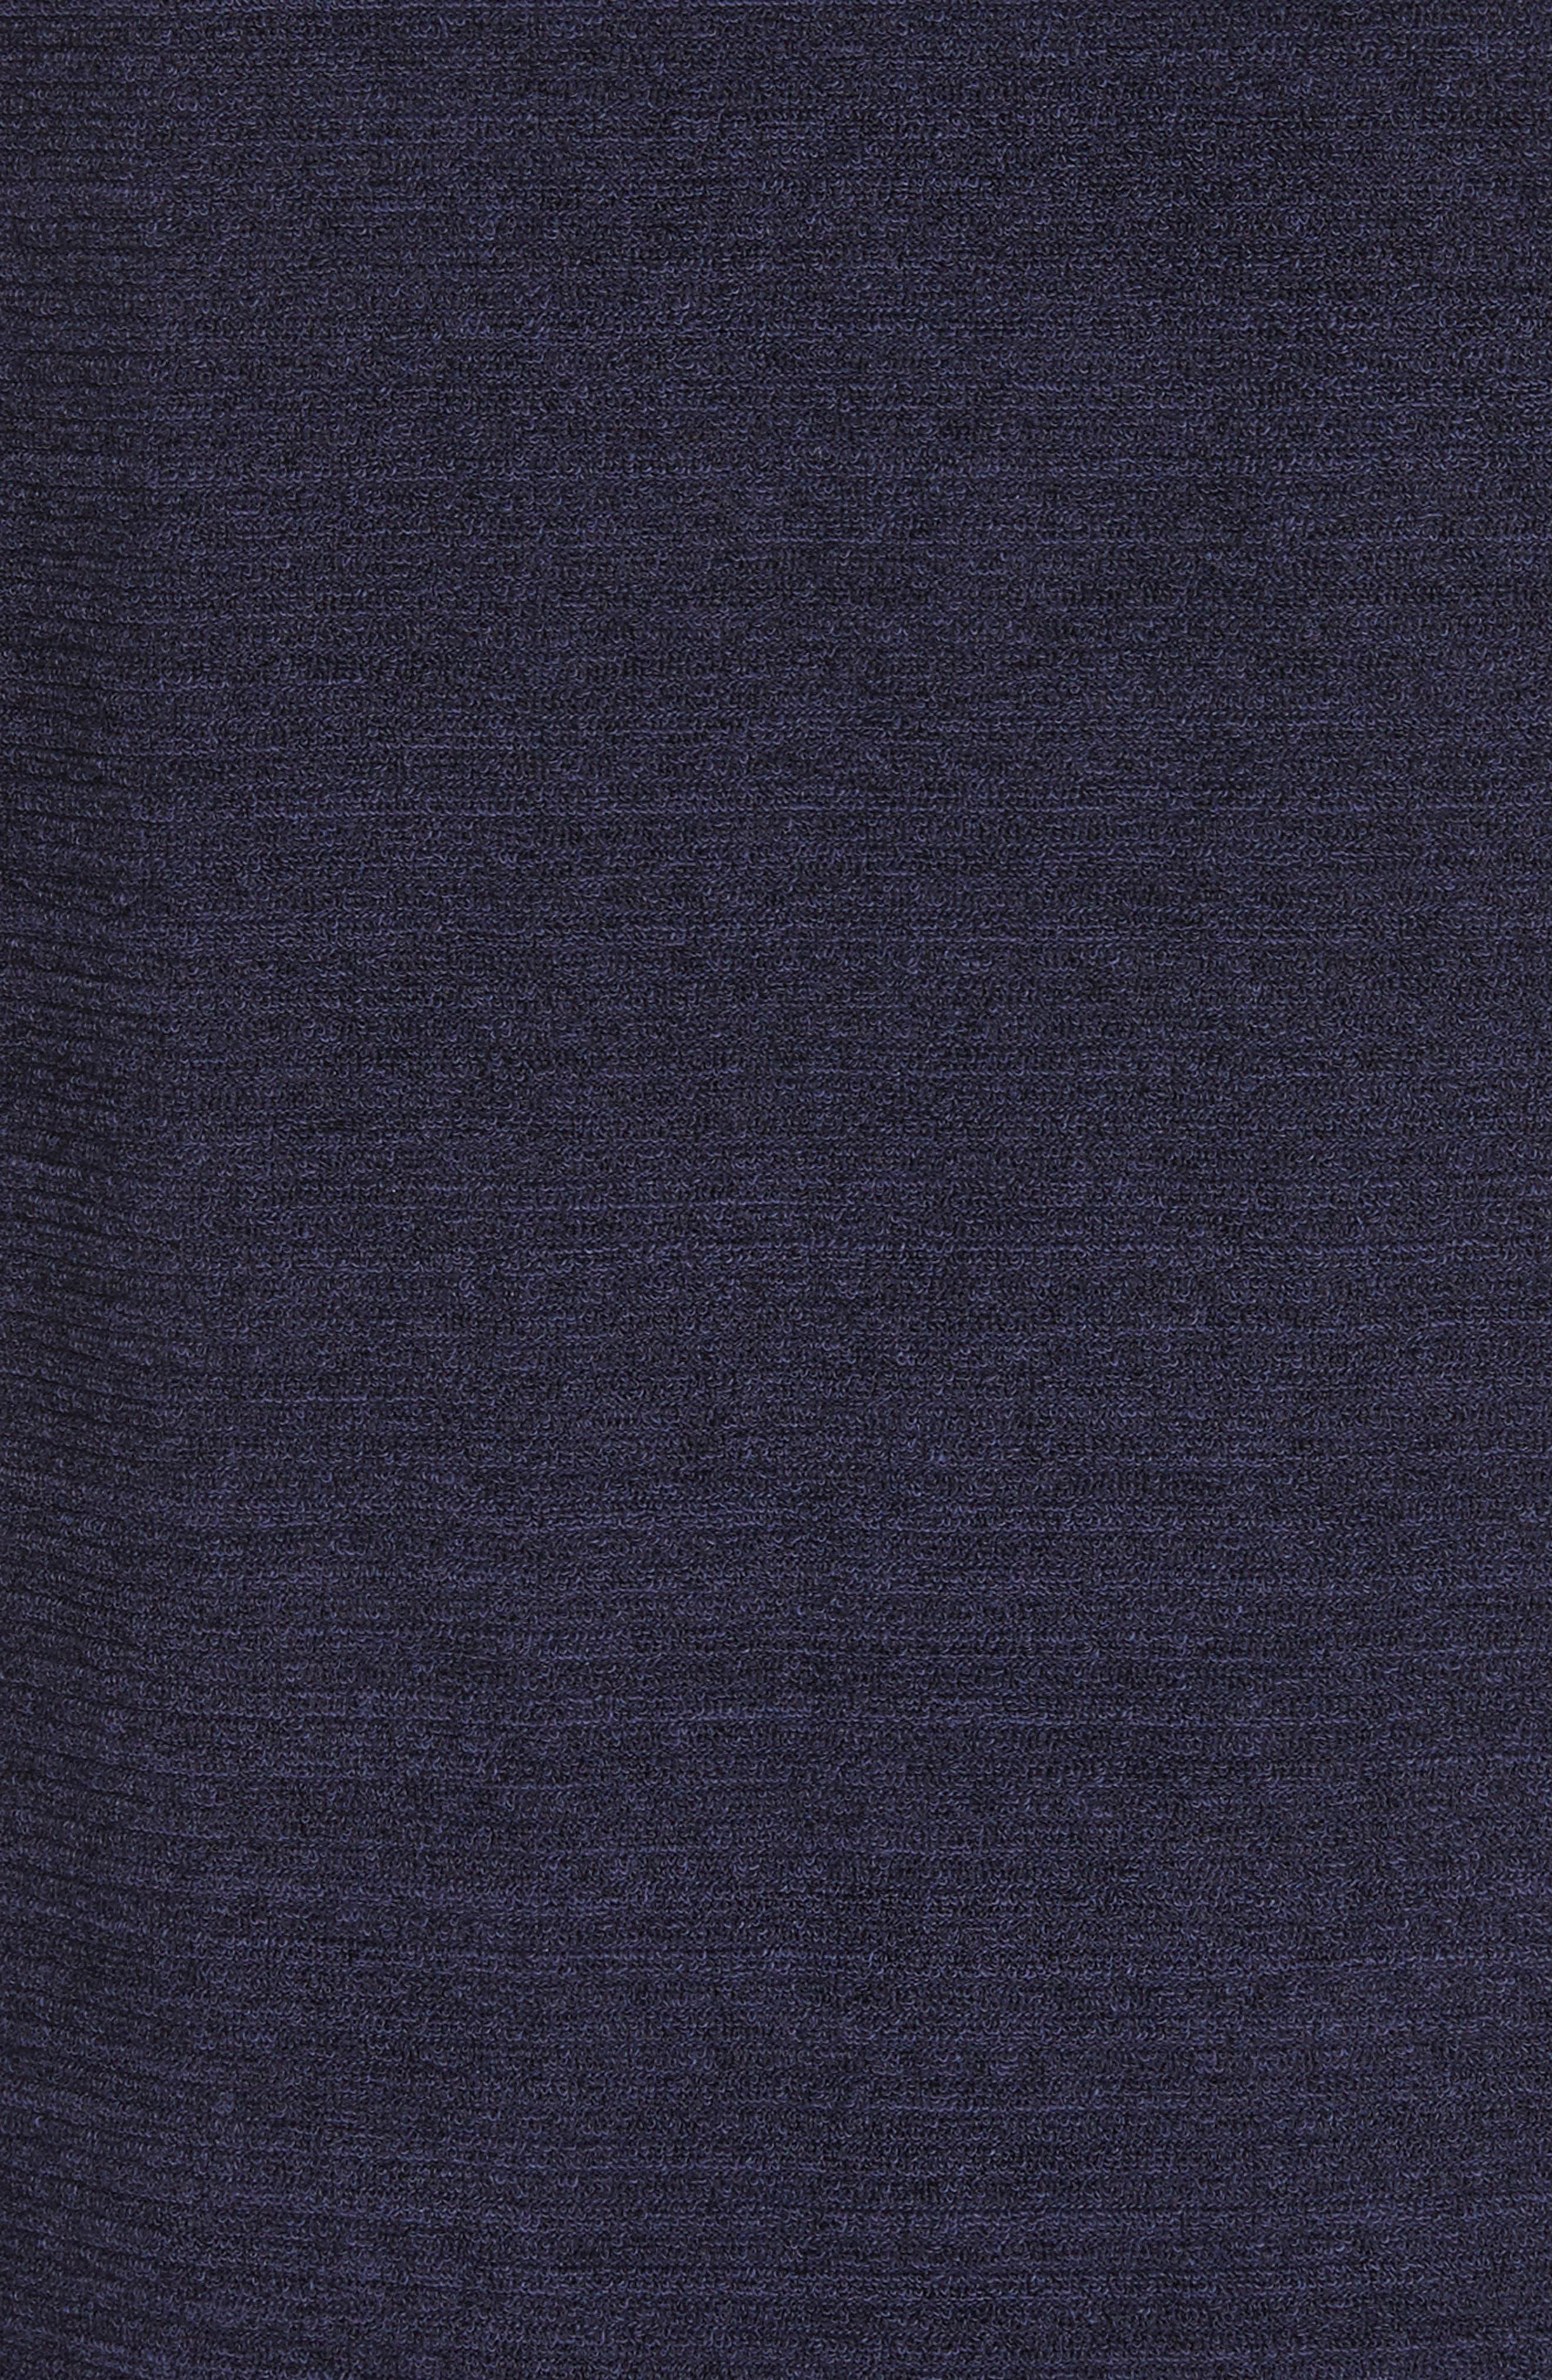 Jeremie Crewneck Sweater,                             Alternate thumbnail 5, color,